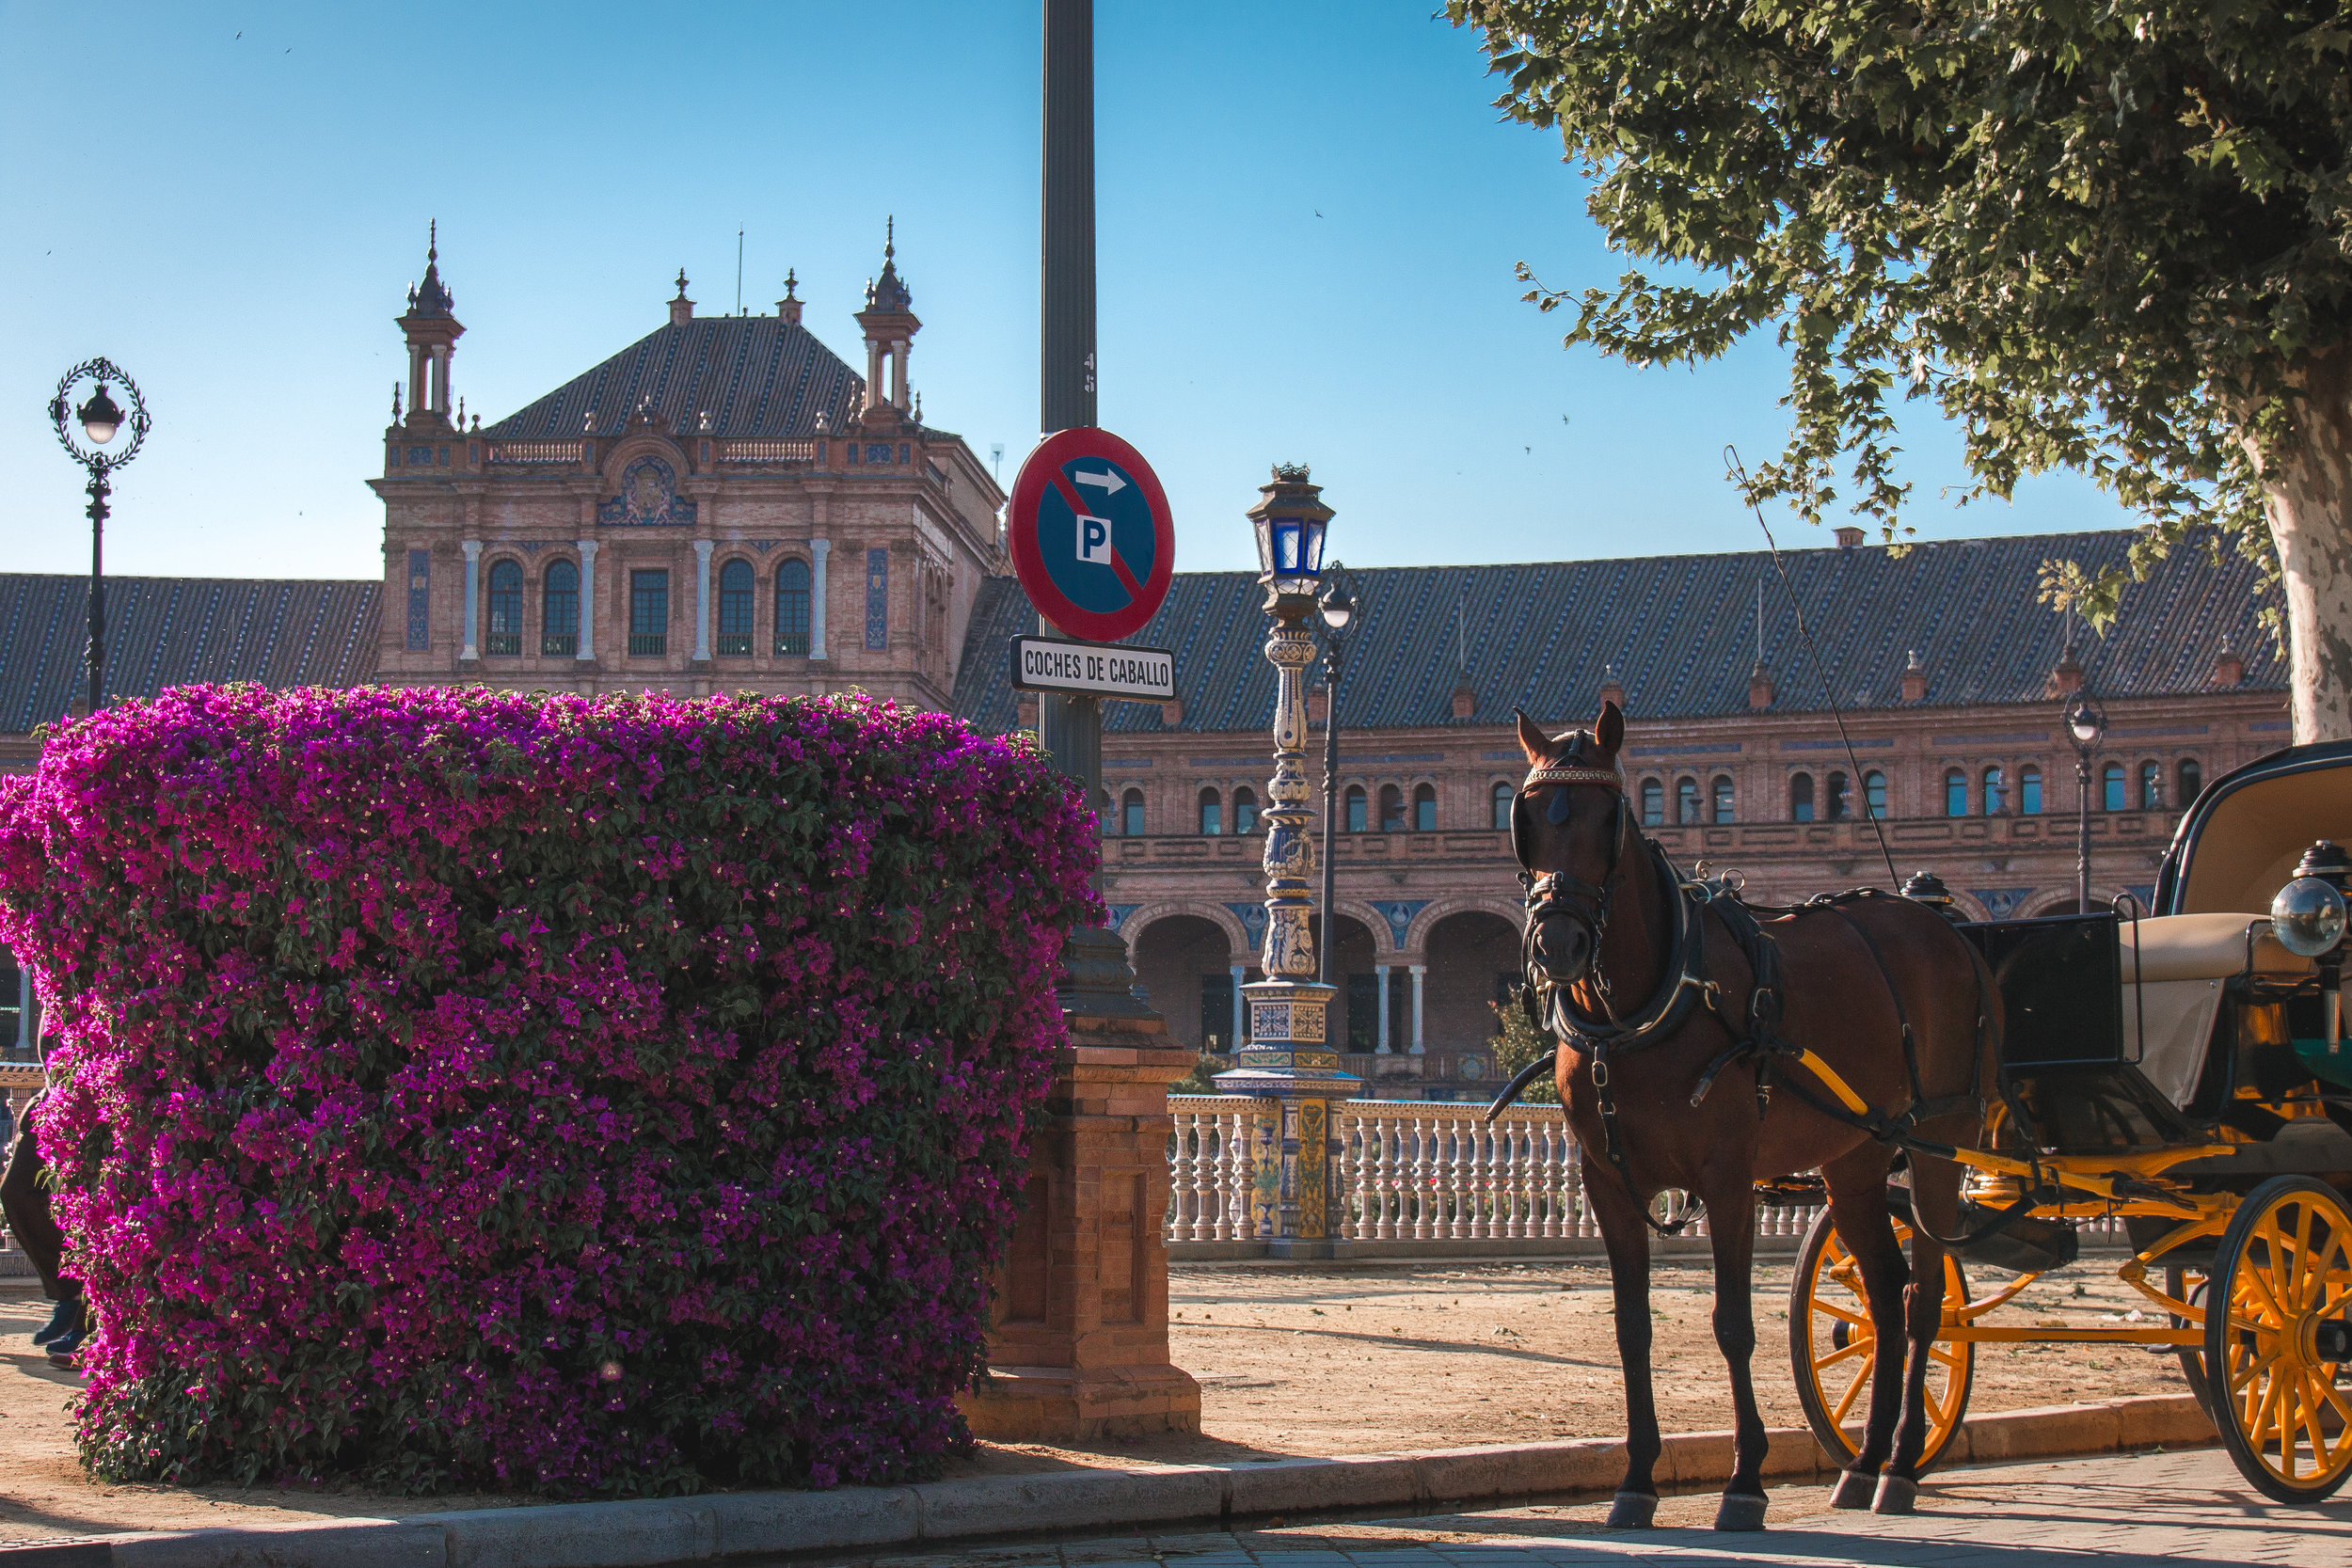 horse-drawn-carriage-seville-spain.jpg